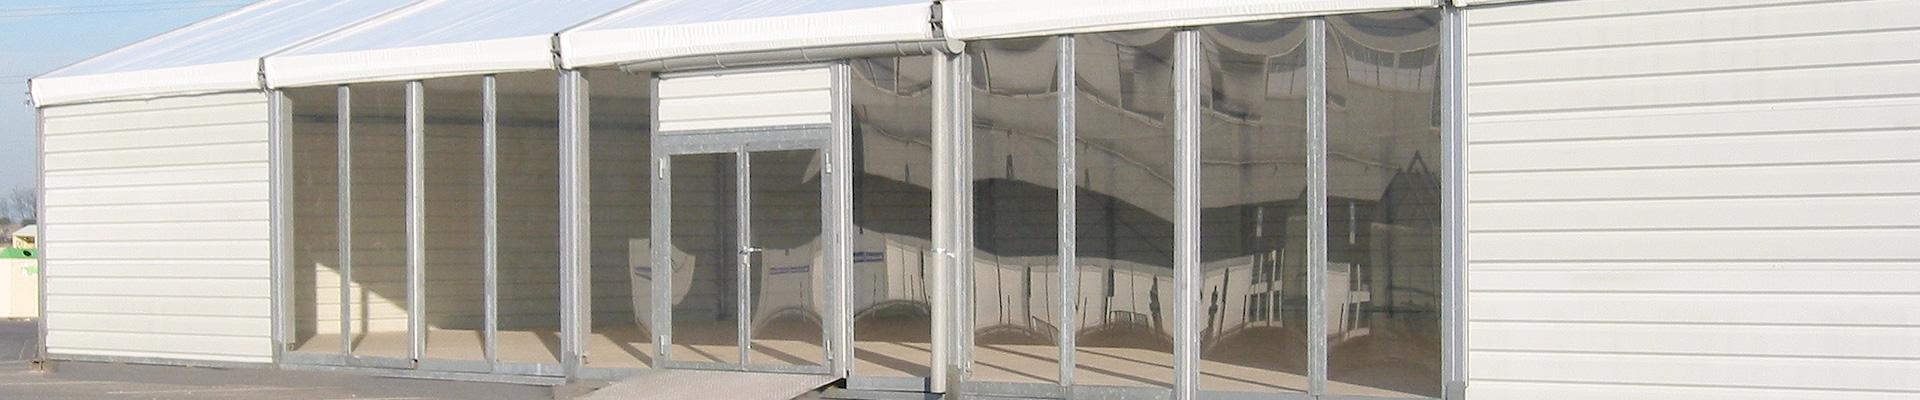 Glaswand im Zelt